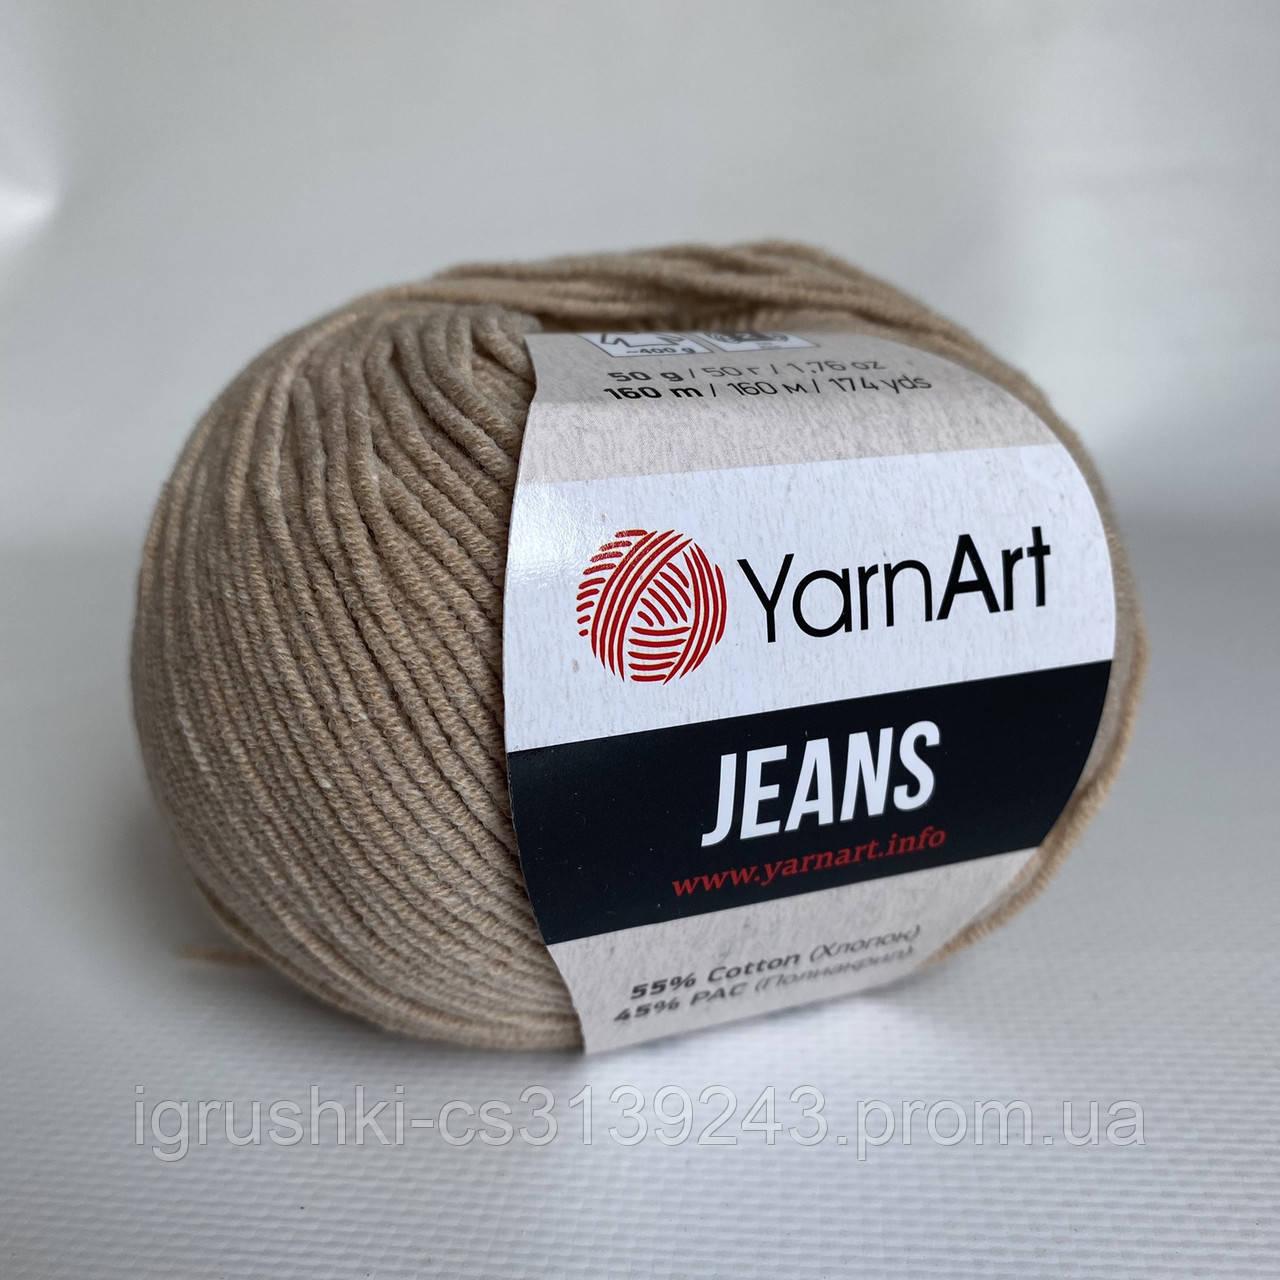 YarnArt Jeans (ярнарт джинс)  87 Латте